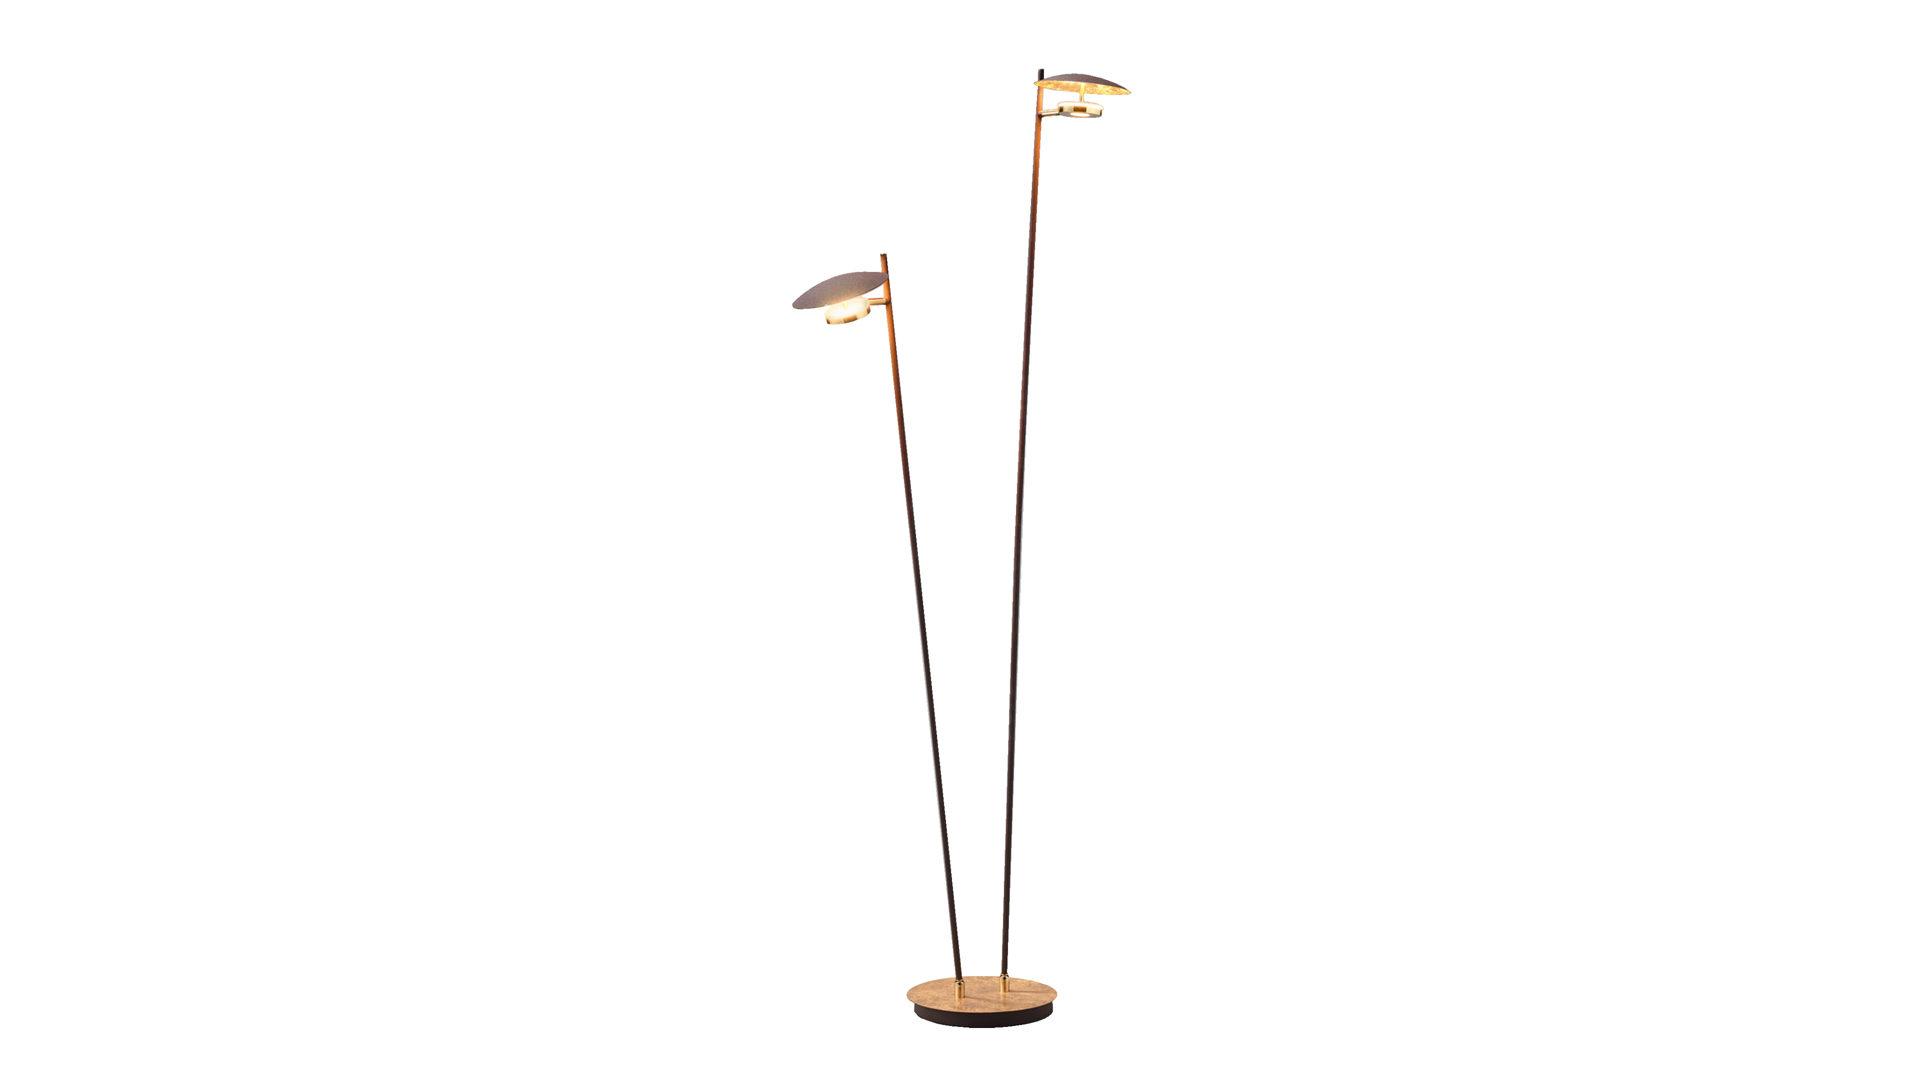 LED-Stehleuchte Nogan, goldfarbenes Metall – Höhe ca. 150 cm, Bad ...